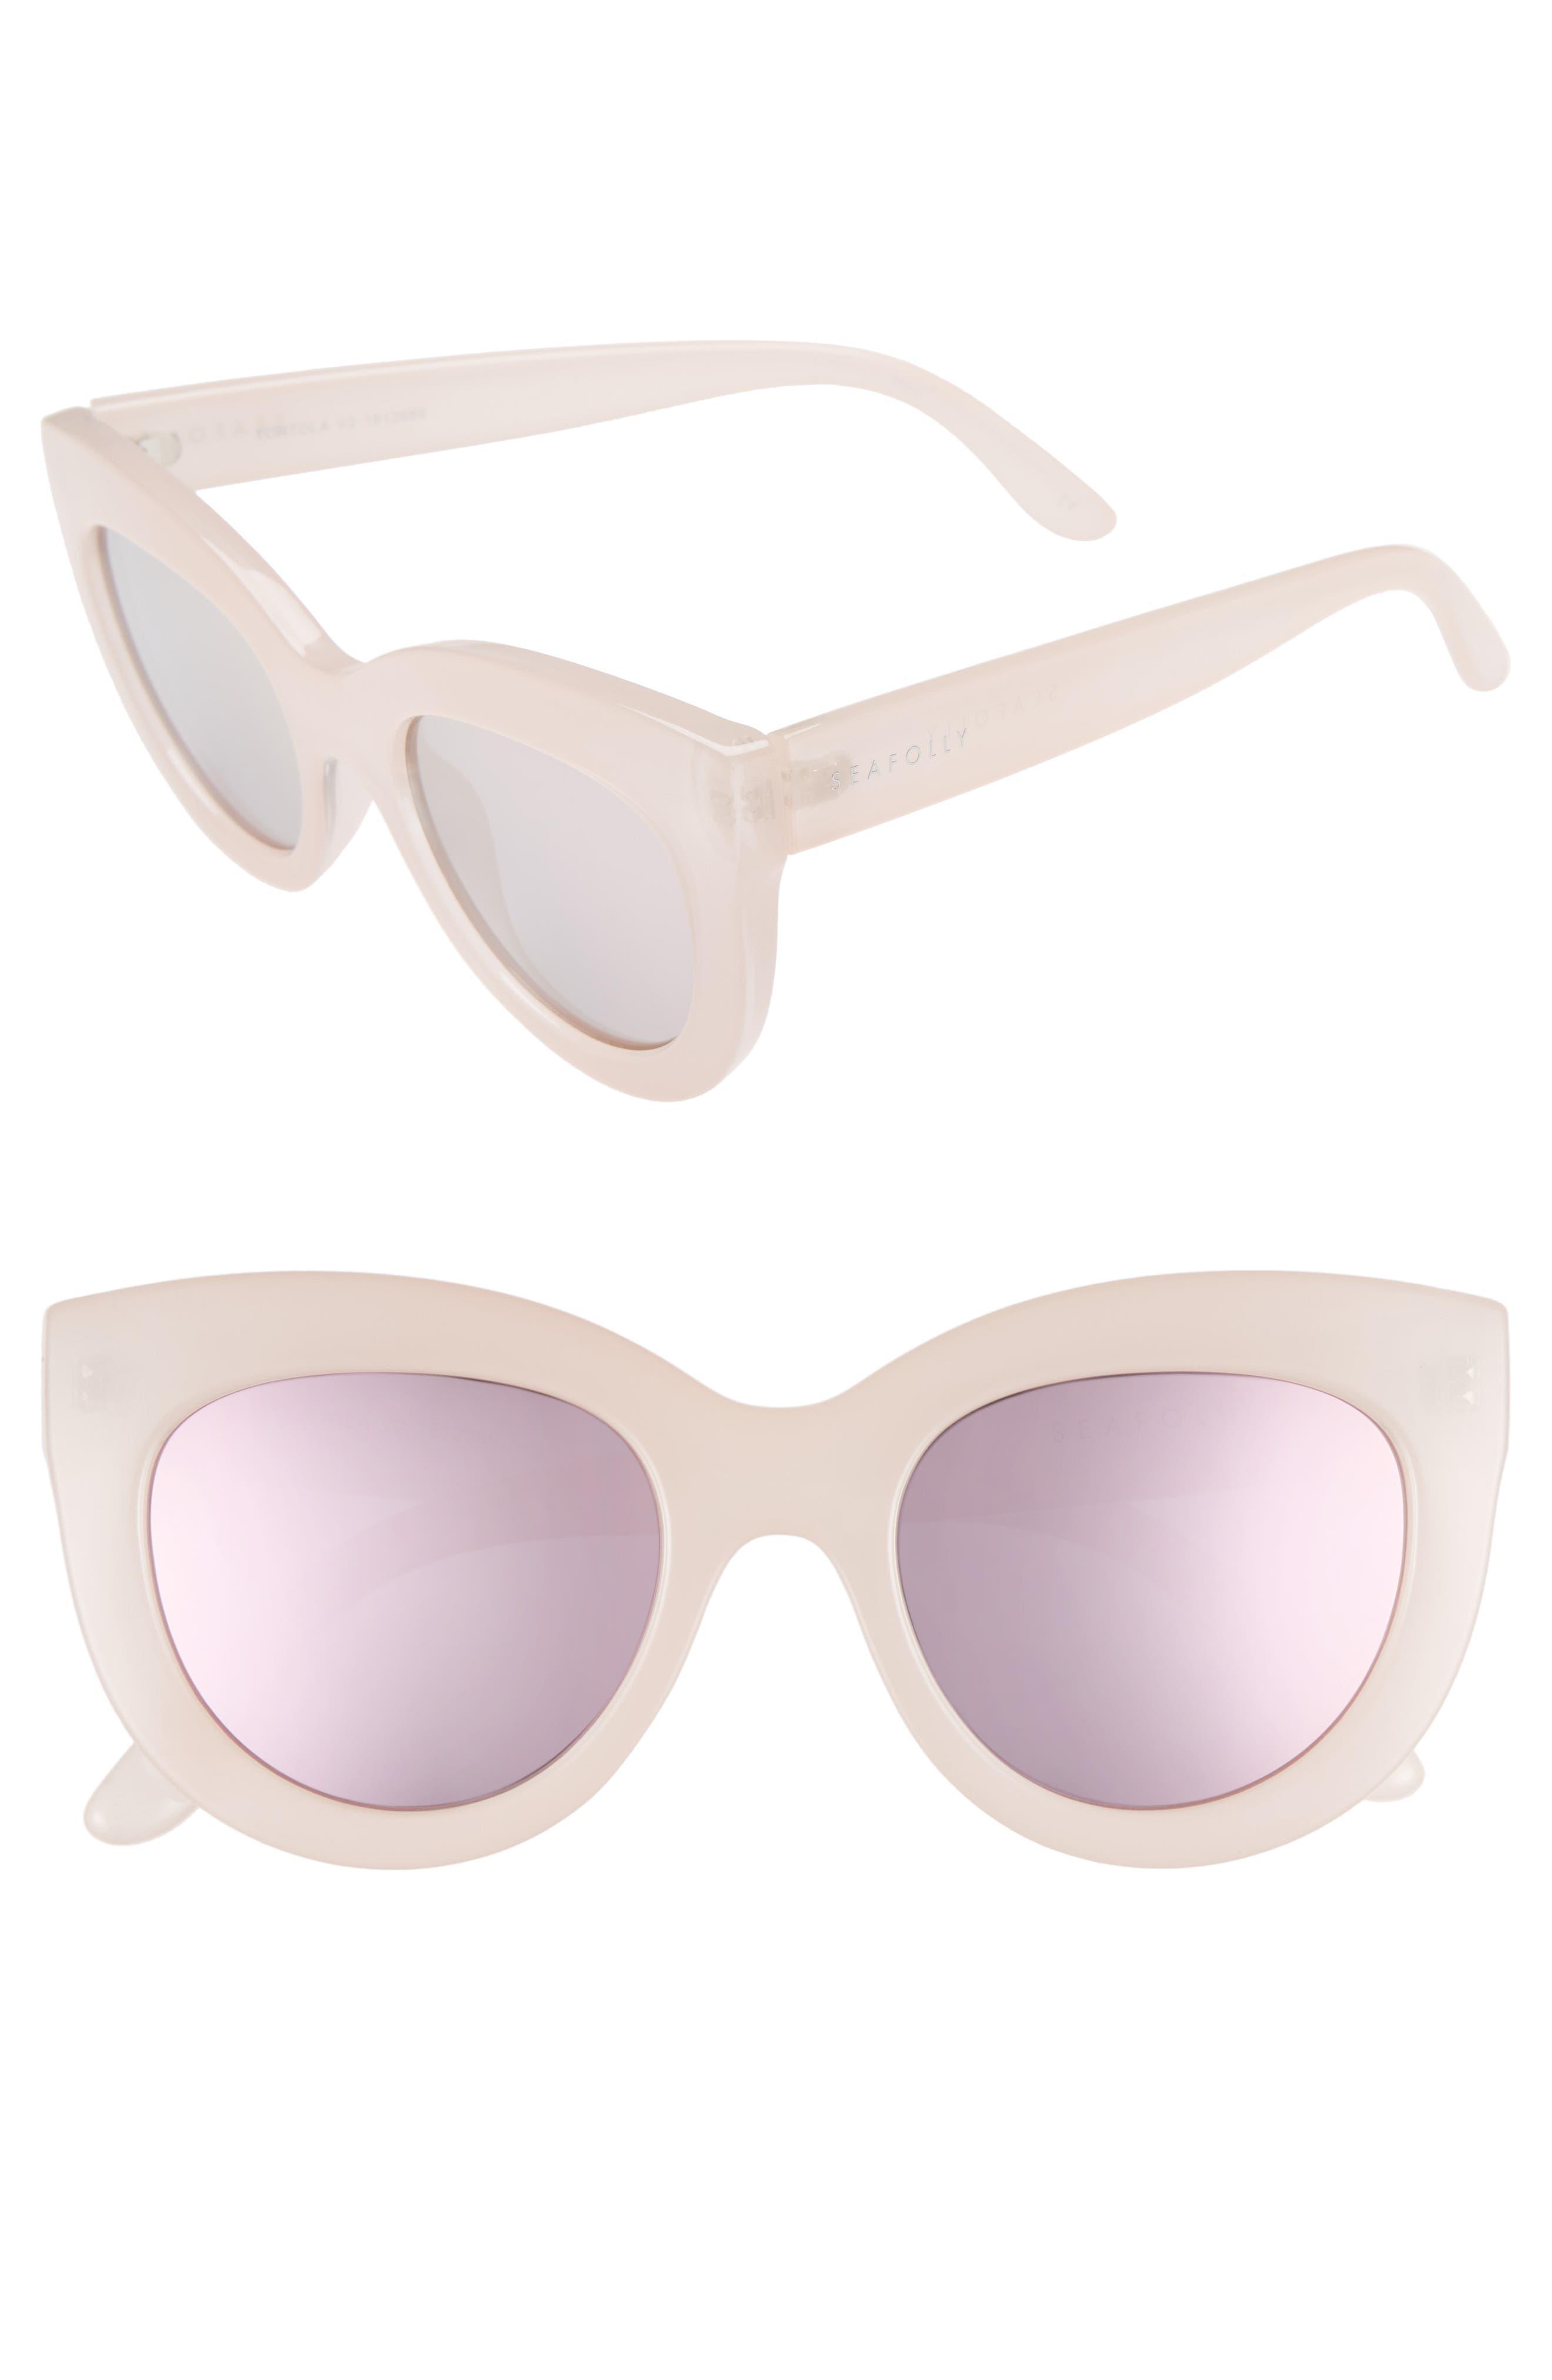 Torola V2 51mm Cat Eye Sunglasses,                         Main,                         color, 660